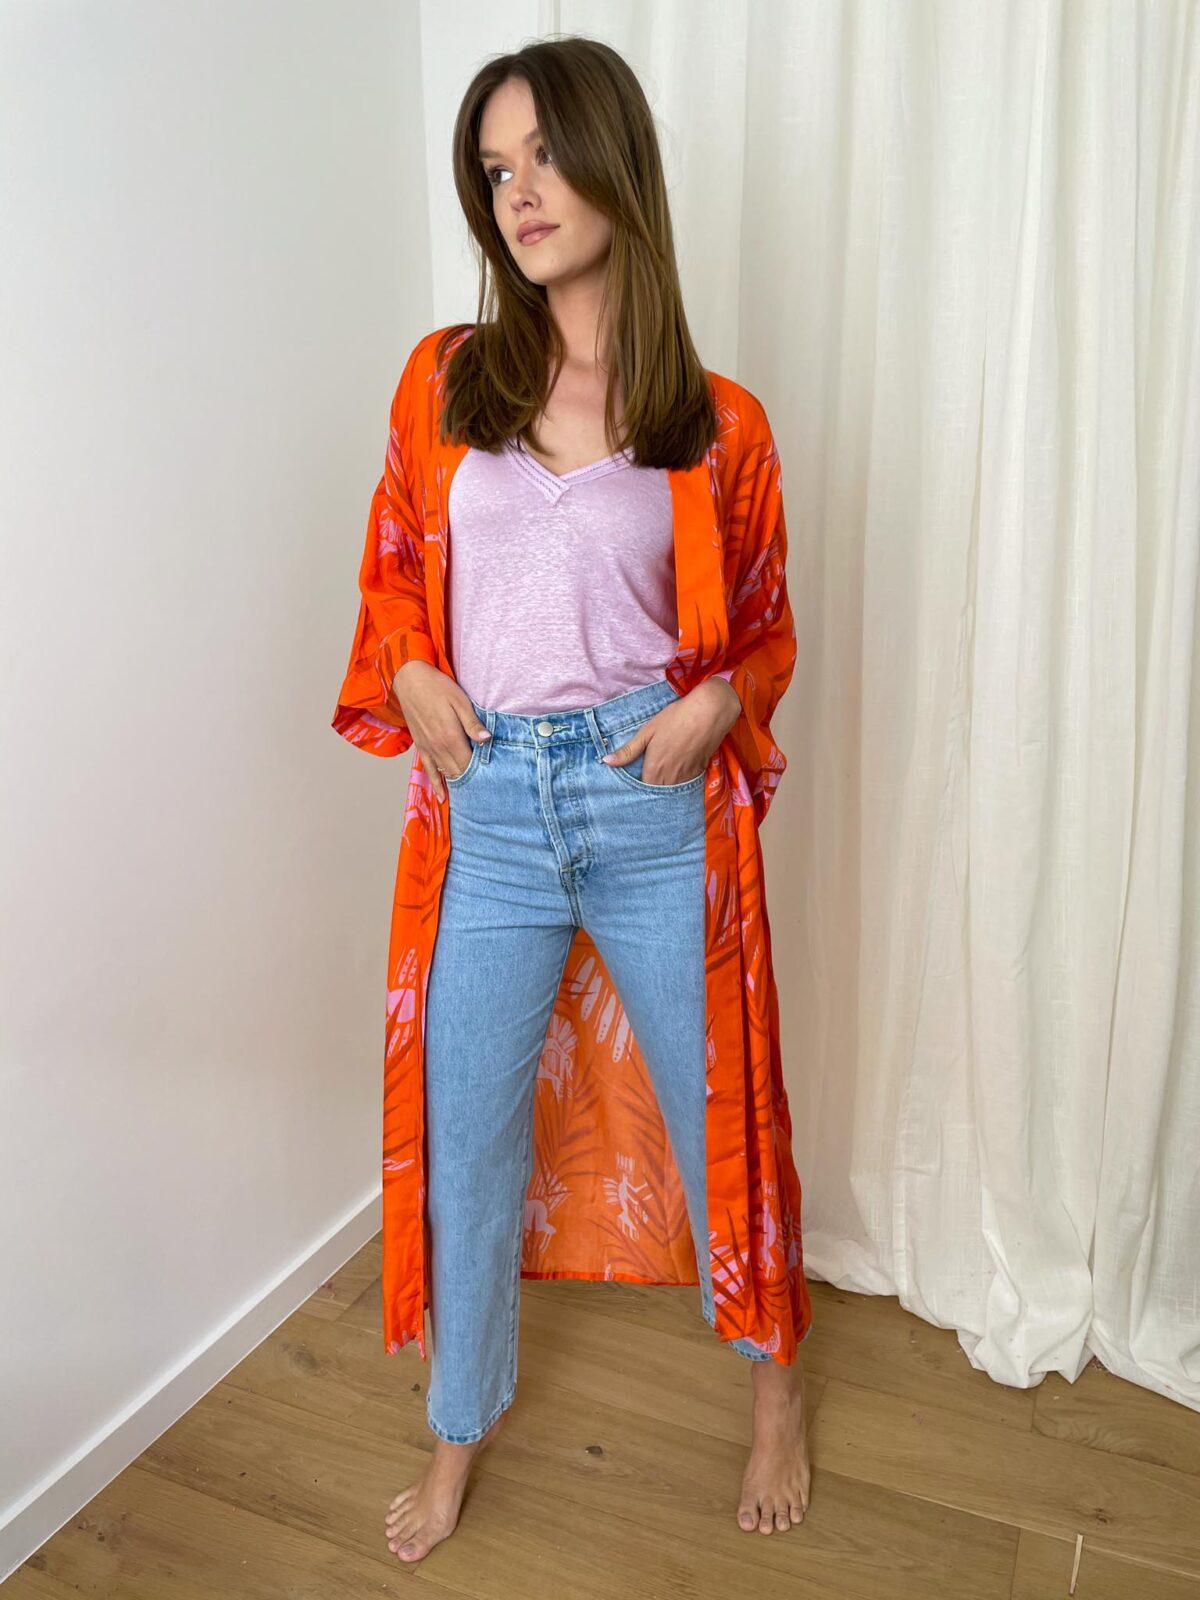 woman with an orange kimono and denim pants